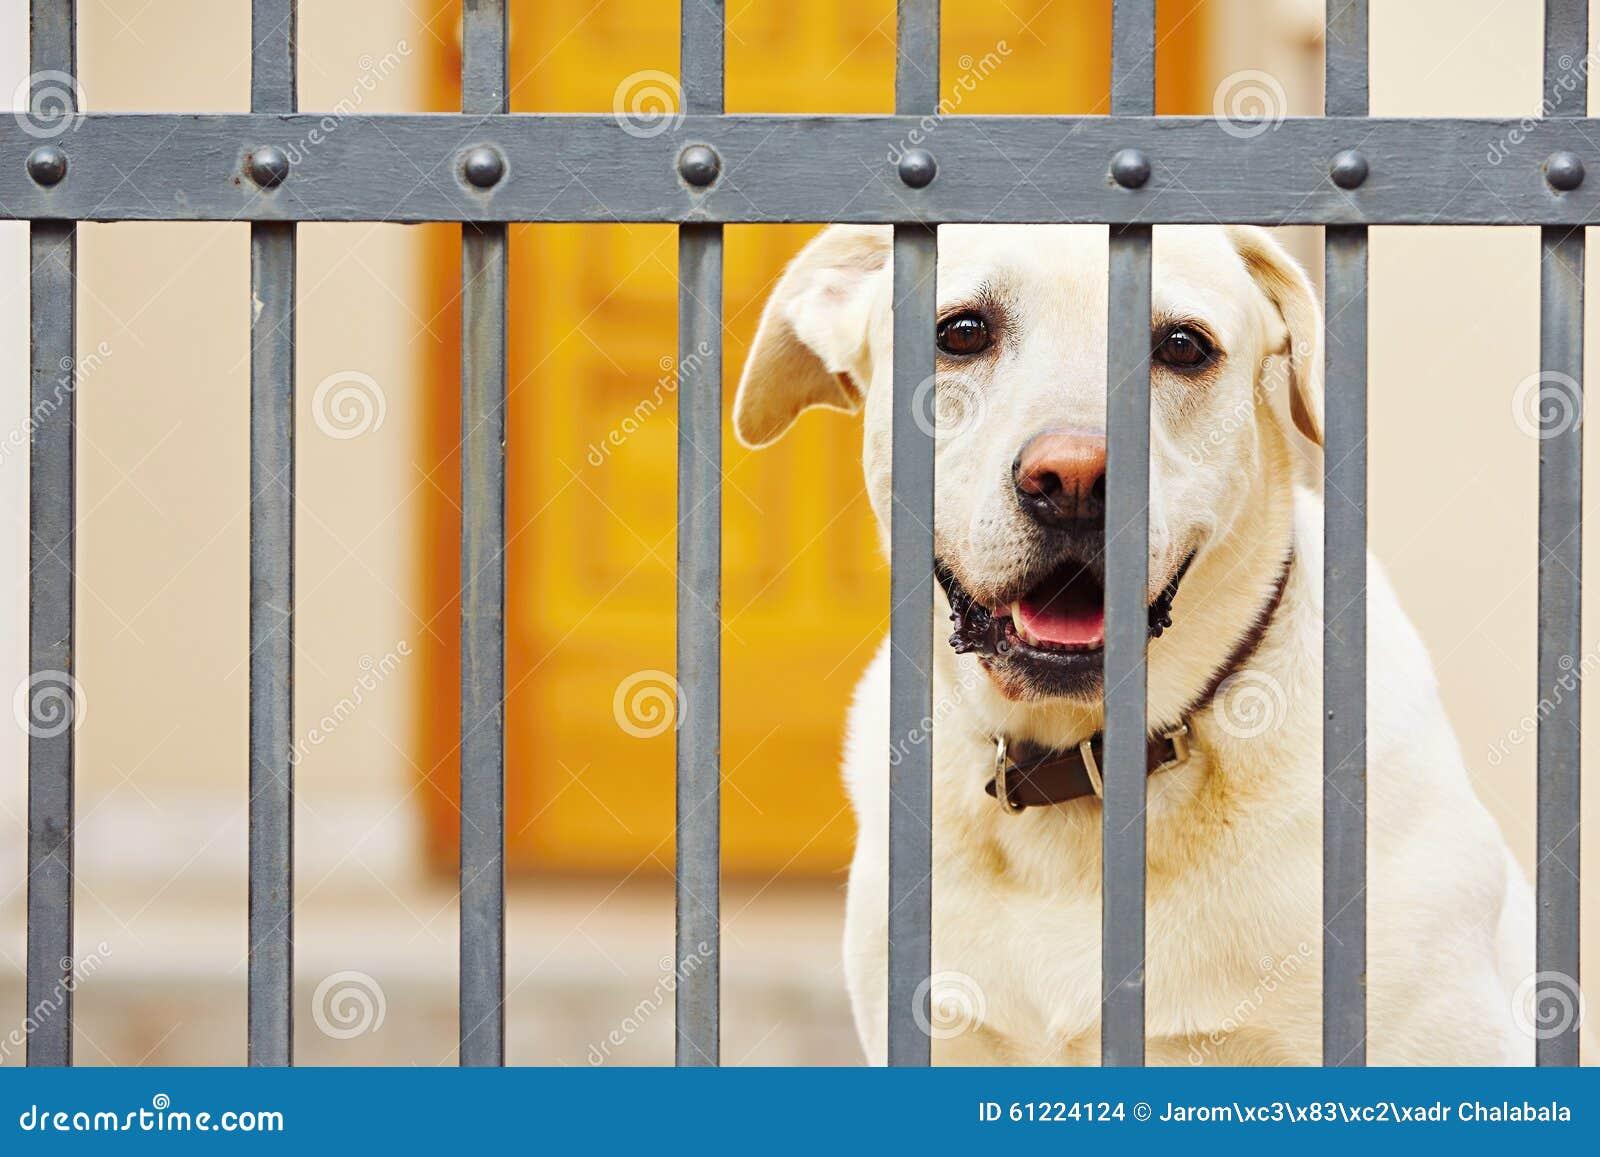 Staket hundstaket : Bak hundstaket arkivfoto. Bild av gulligt, patiens, kuriositet ...